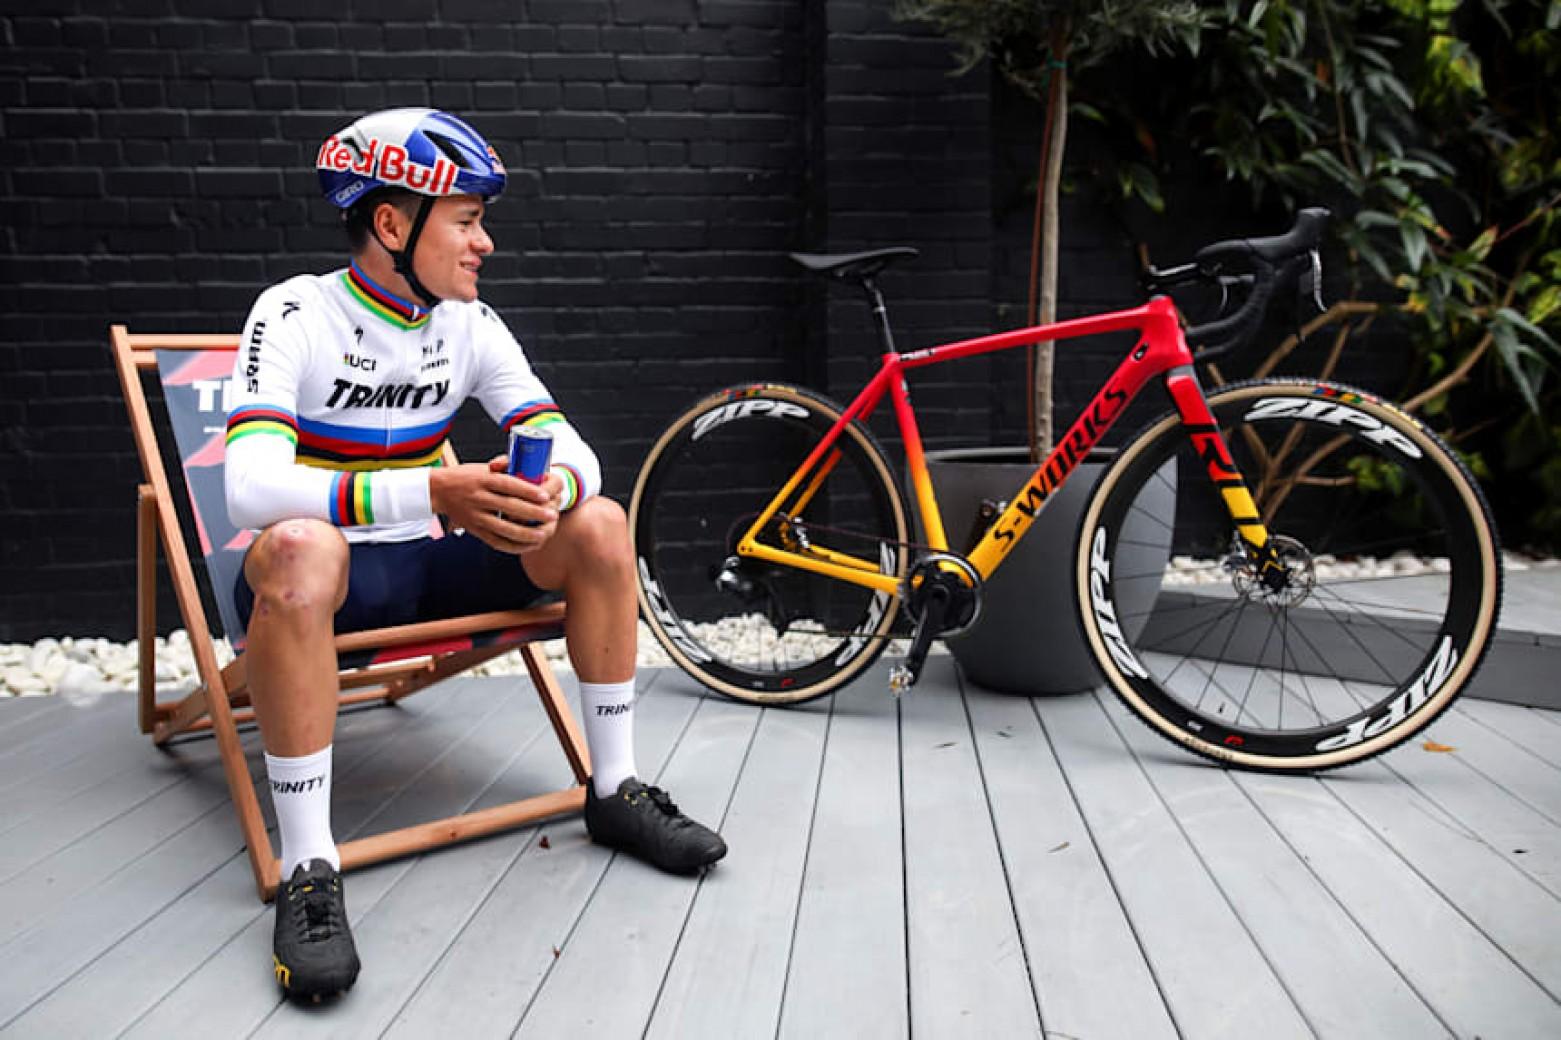 tom-pidcock-ciclismo/